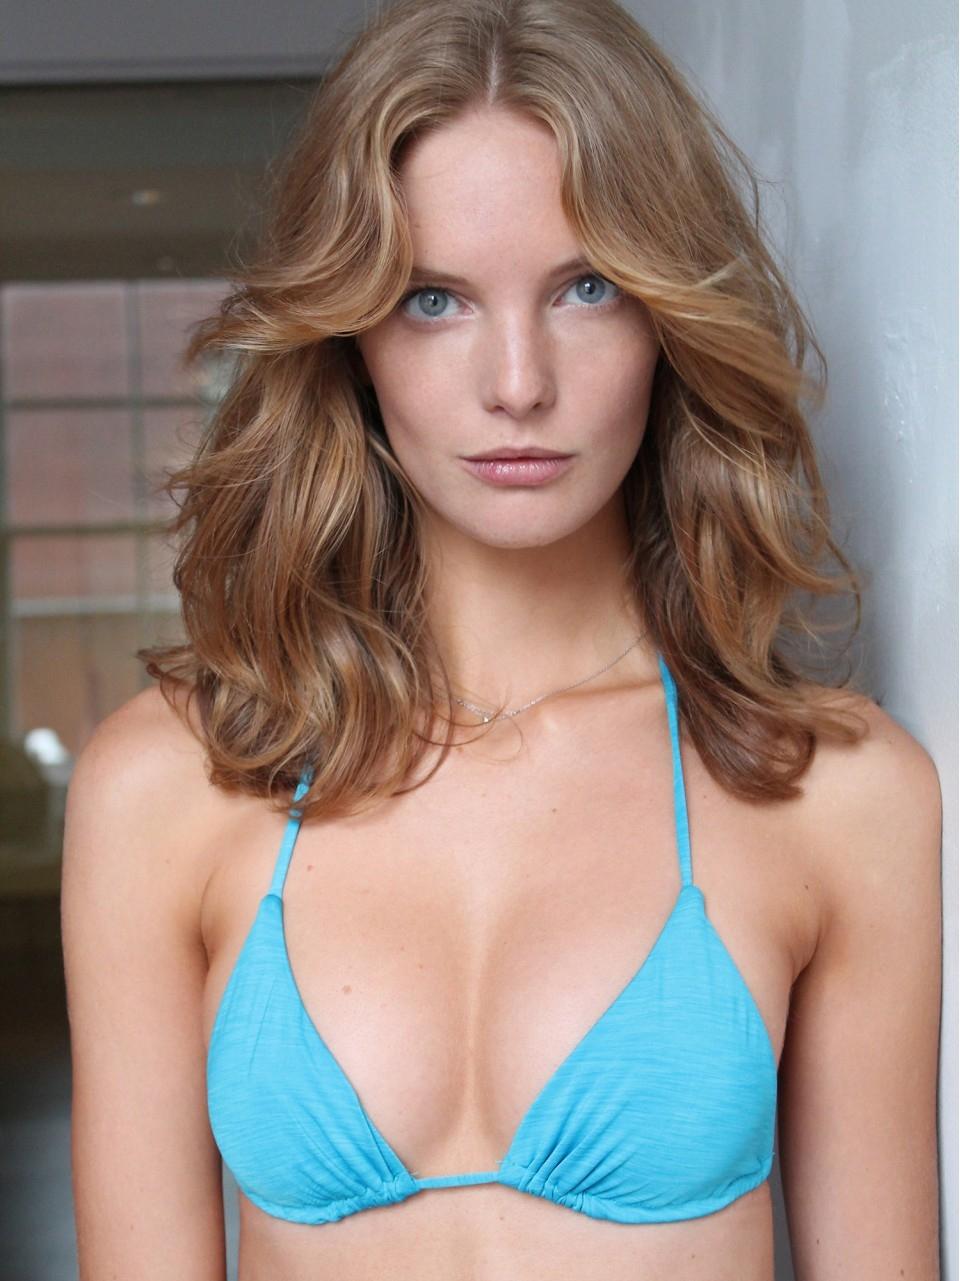 Paparazzi Clara Settje nudes (28 photos), Tits, Sideboobs, Twitter, in bikini 2015